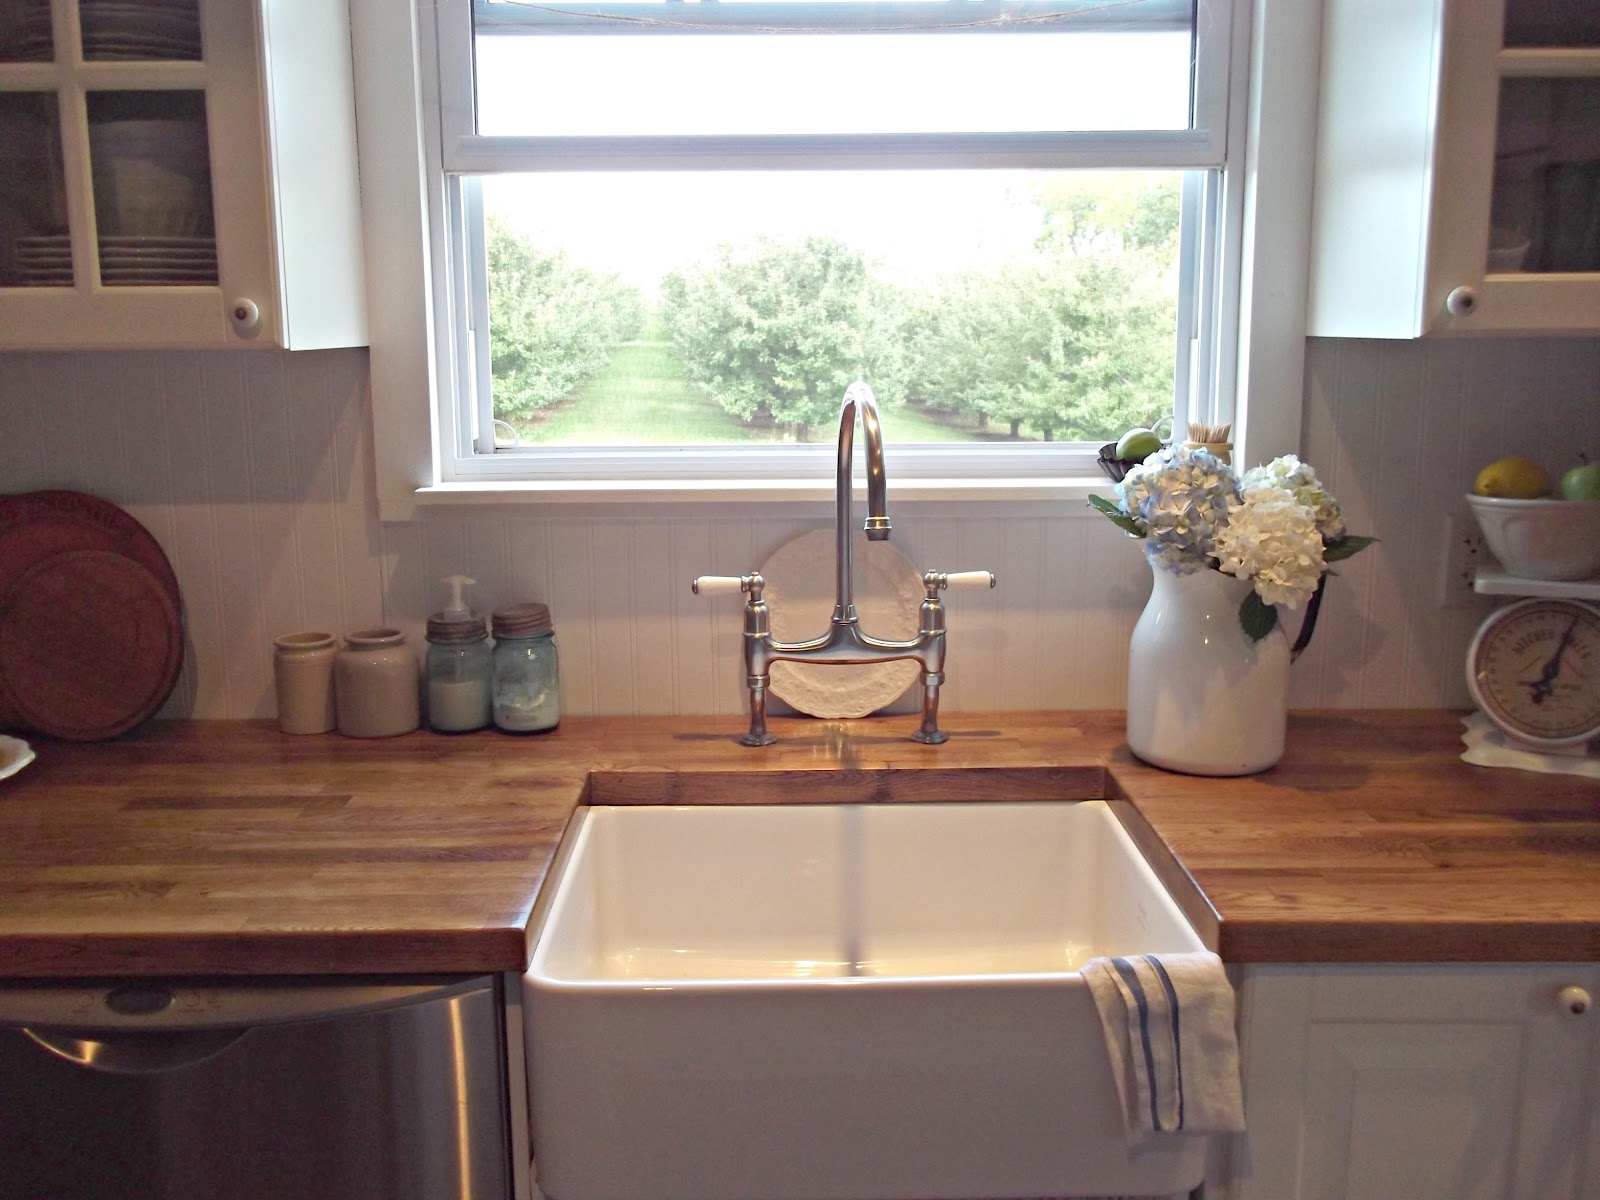 Rustic Farmhouse: A Farm Style Sink on Farmhouse Countertops  id=27389